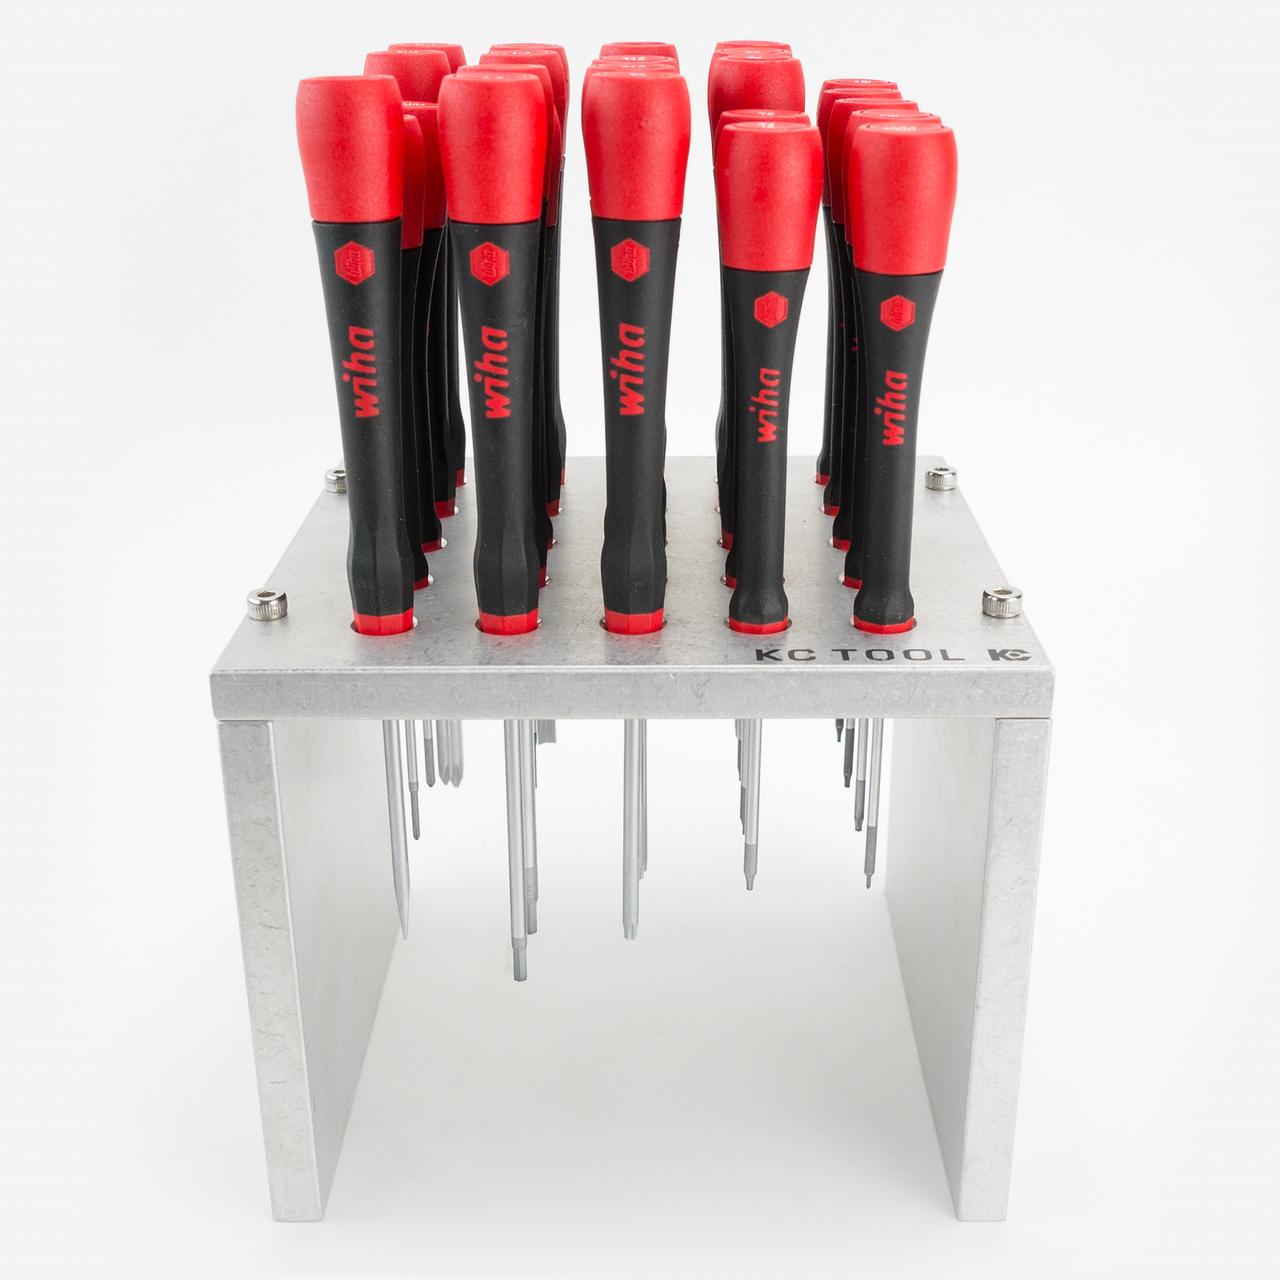 Wiha 26091 PicoFinish Precision Screwdriver Set w/ KC Tool Stand, 25 Pieces - KC Tool